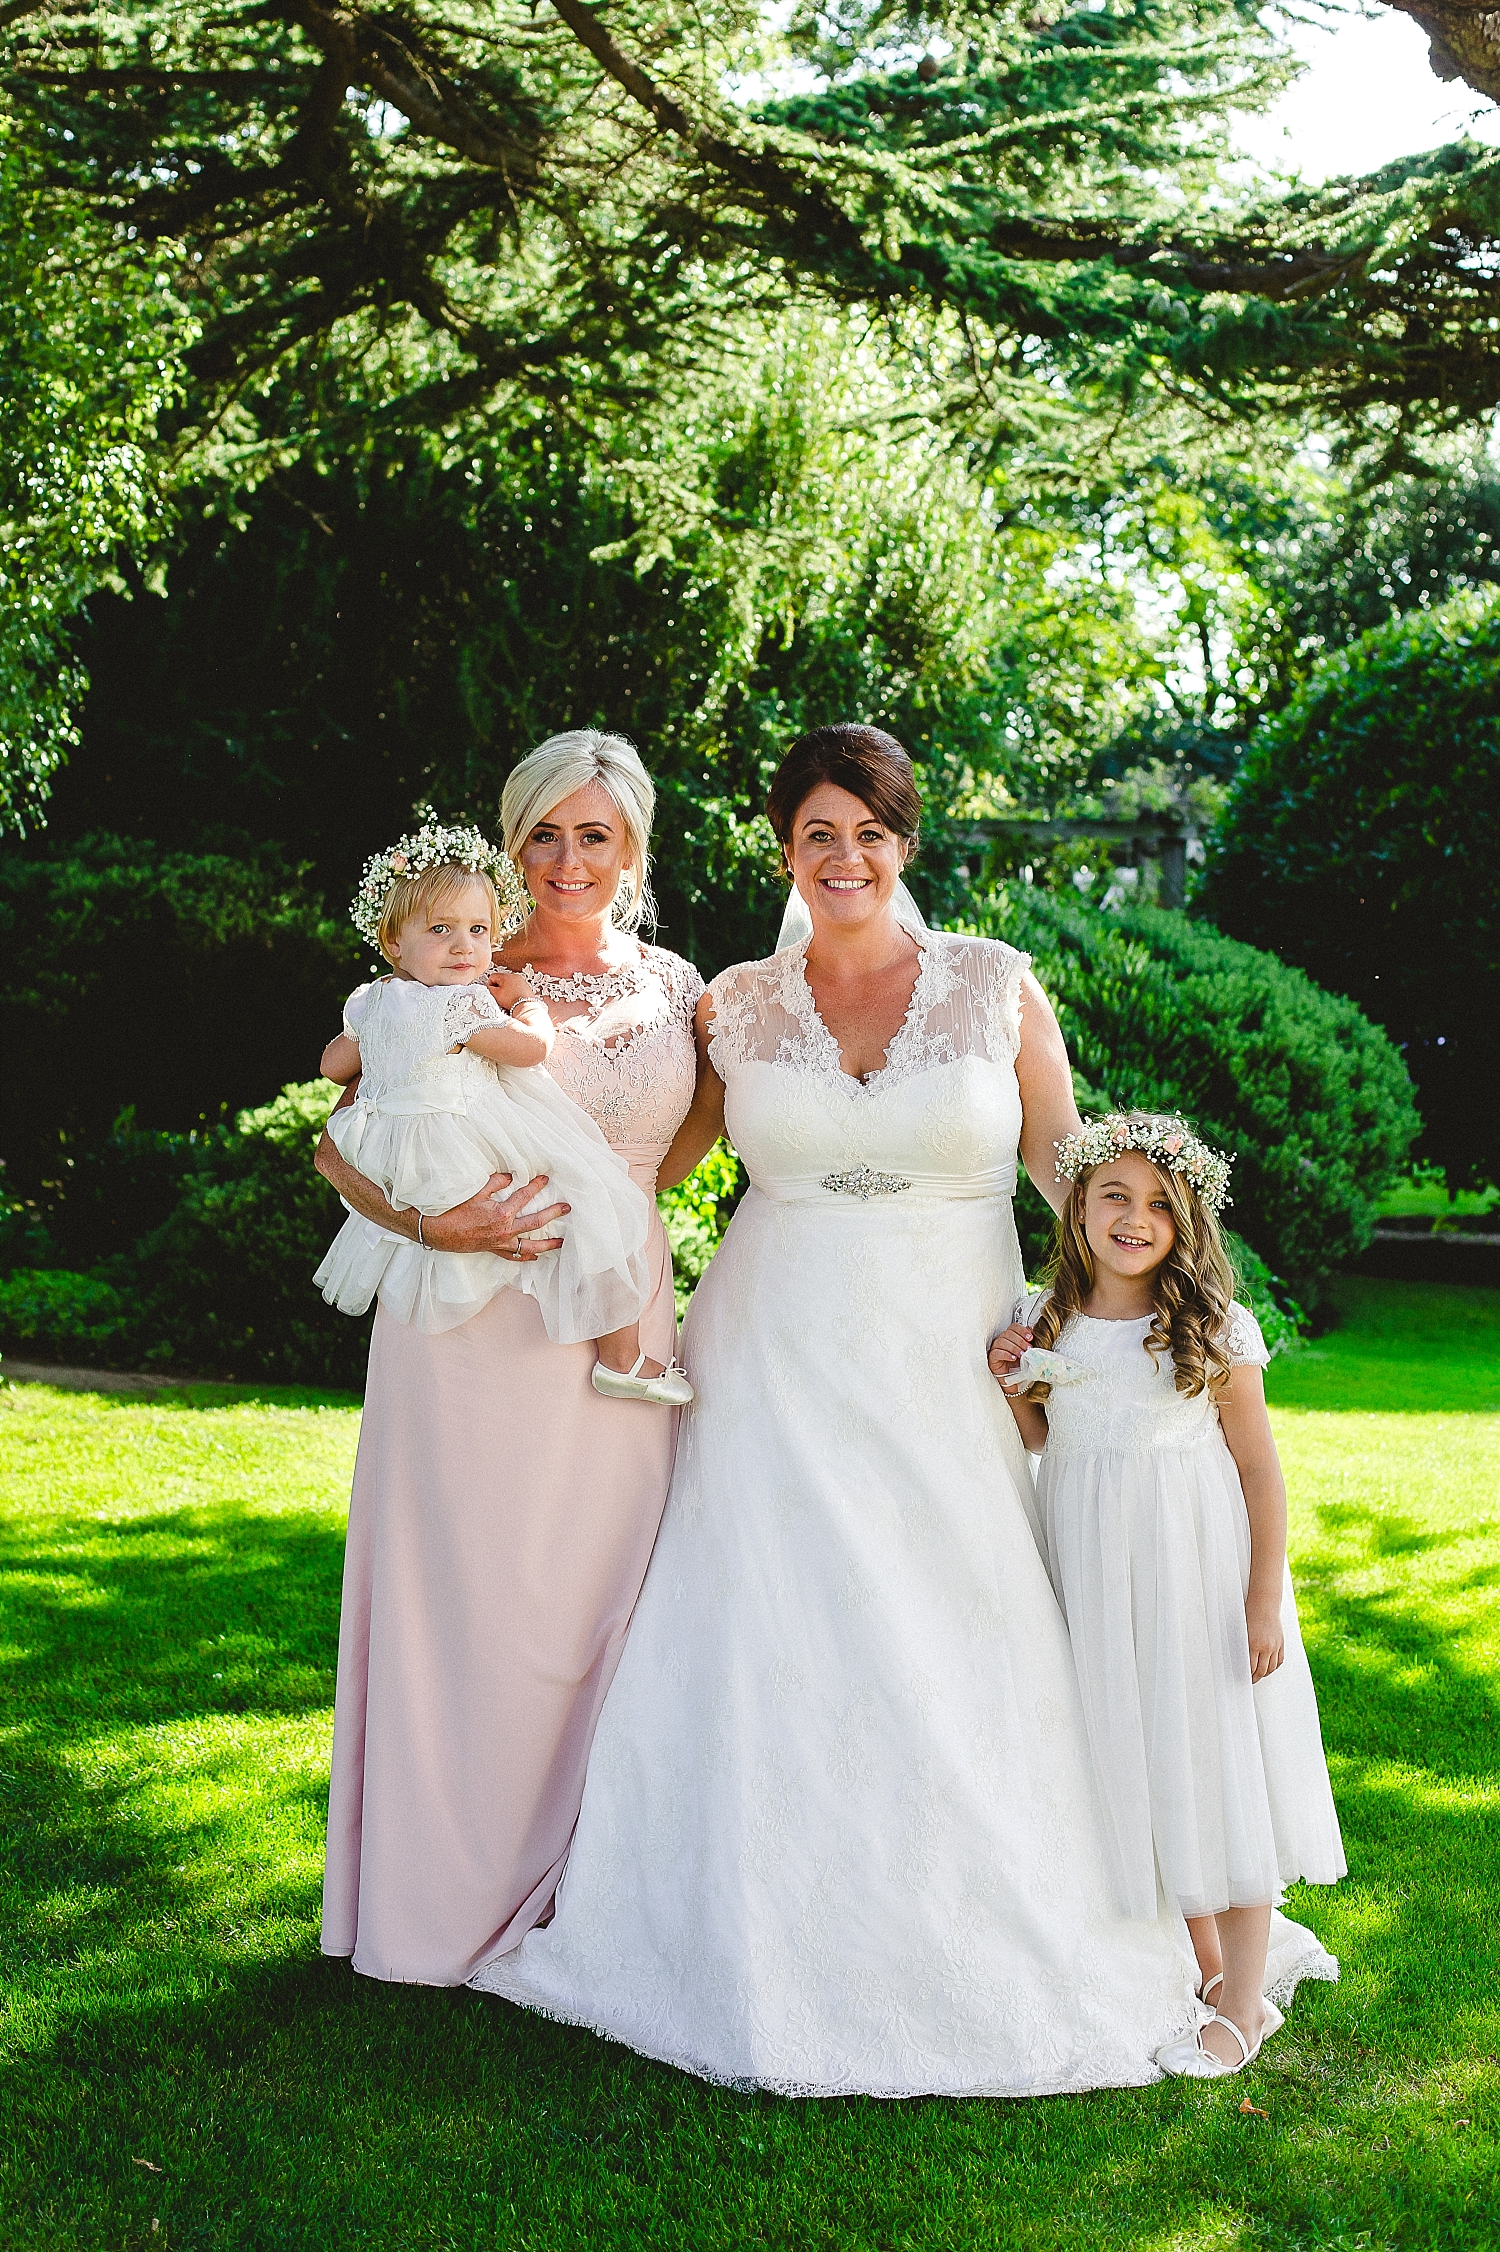 Moor Hall Wedding - Bridal Party - Anesta Broad Photography